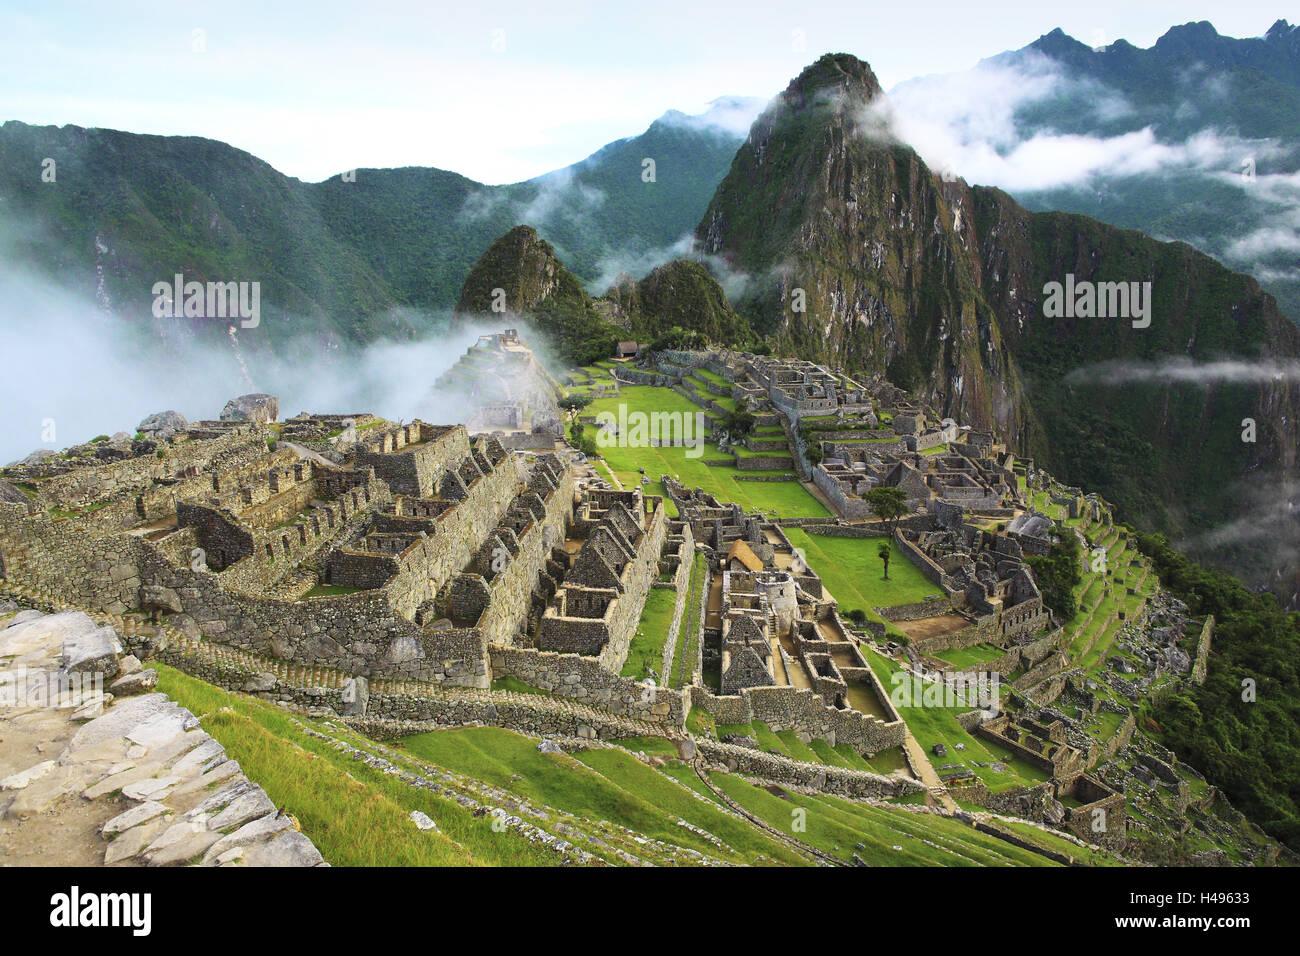 Modern 7 wonders of the world - Peru Machu Picchu 7 Wonders Of The World Of The Modern Age